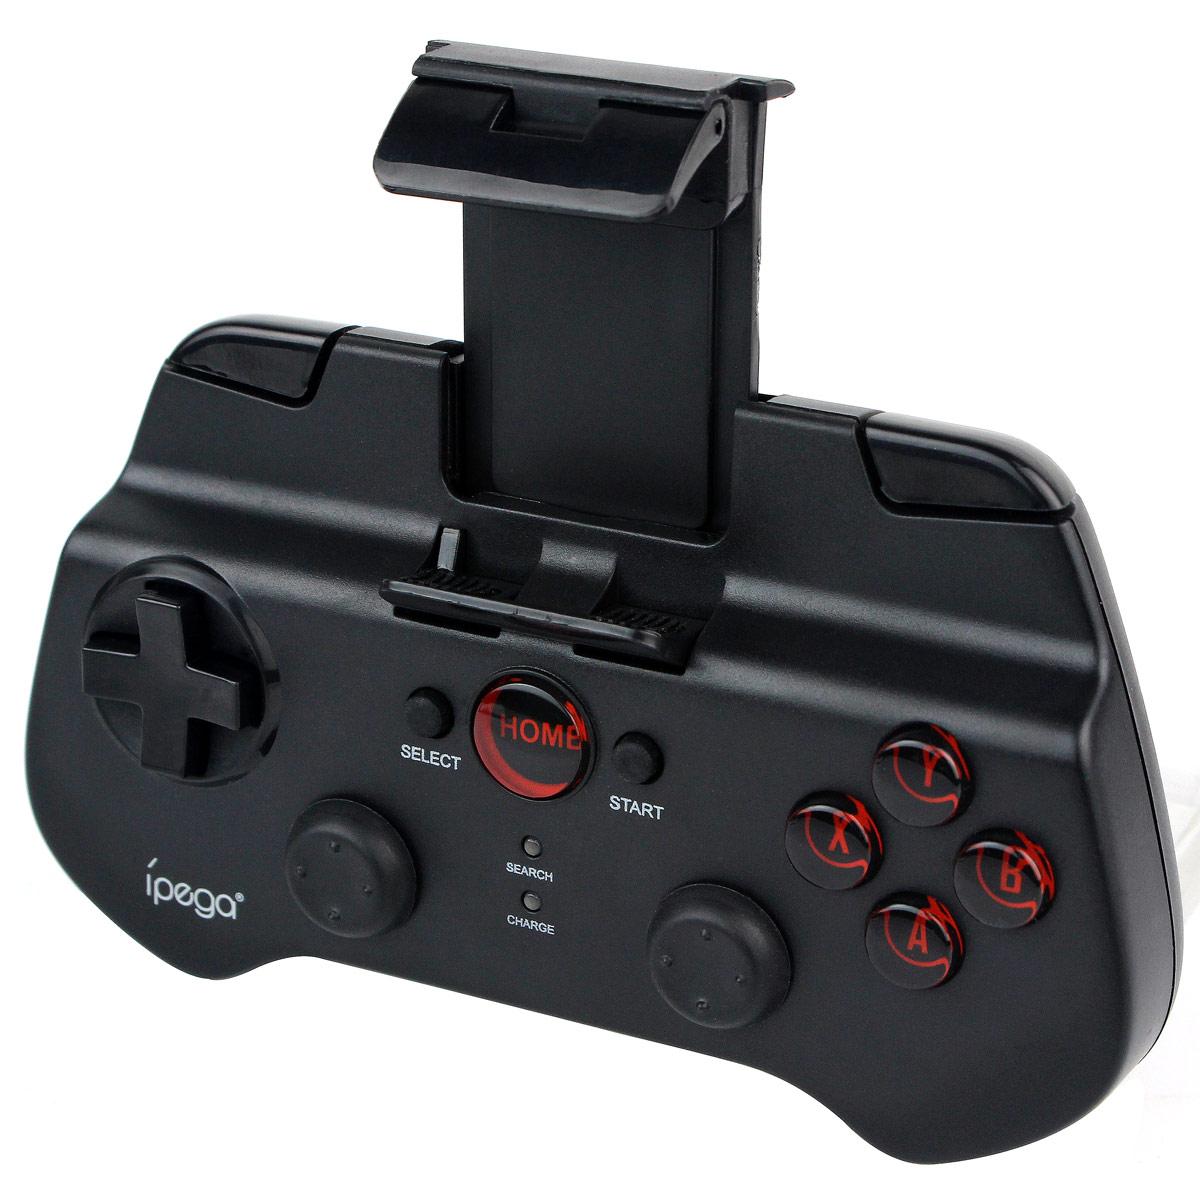 Tay cầm chơi game IPEGA 9025